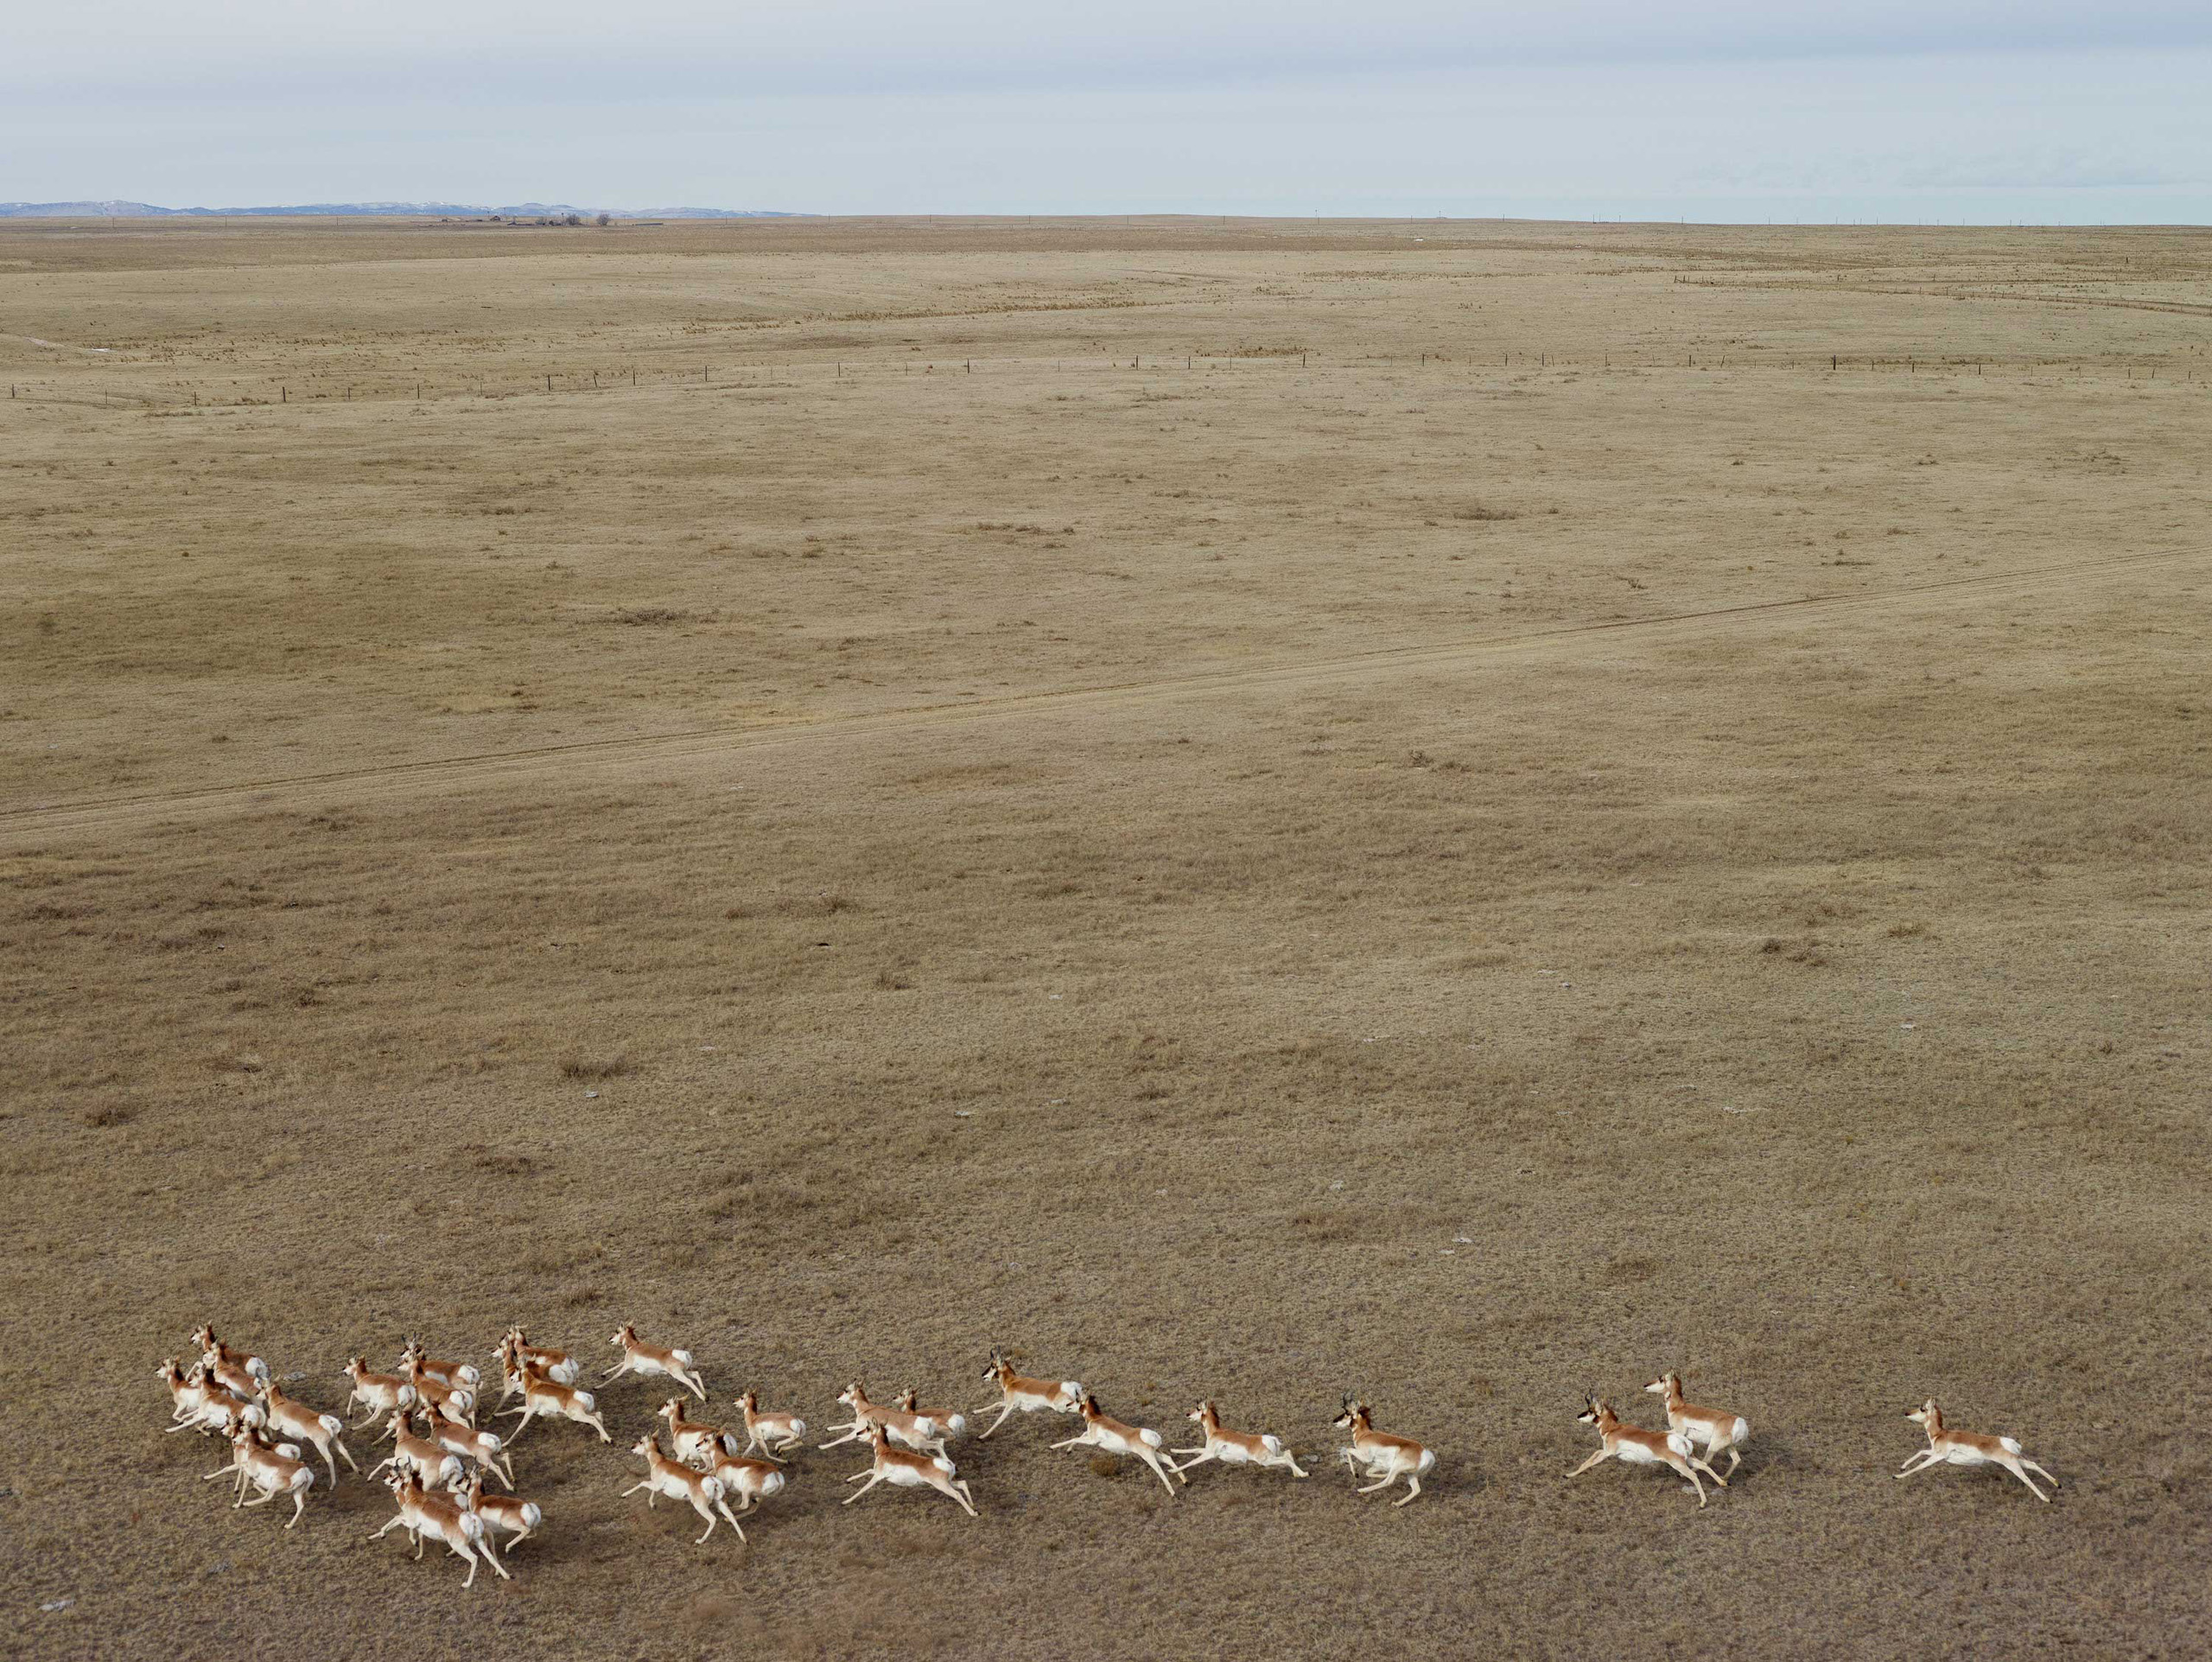 Pronghorn Antelope. Niobrara County, Wyoming, 2013.